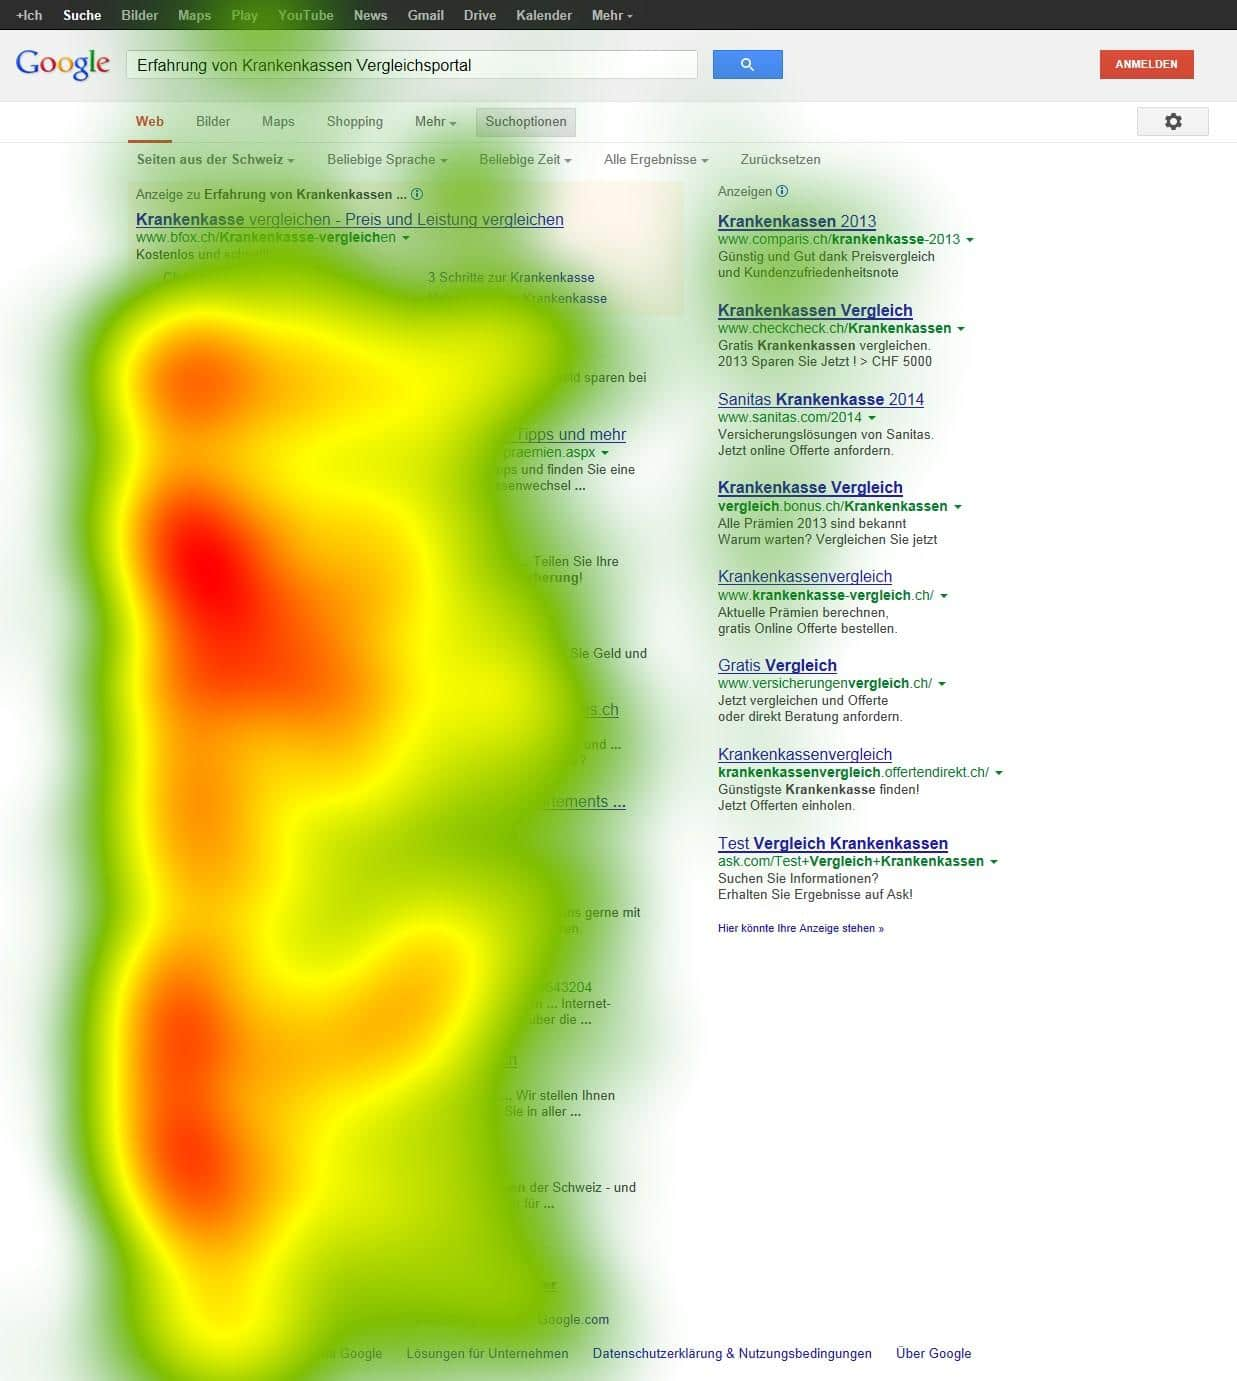 Análisis de mapa de calor